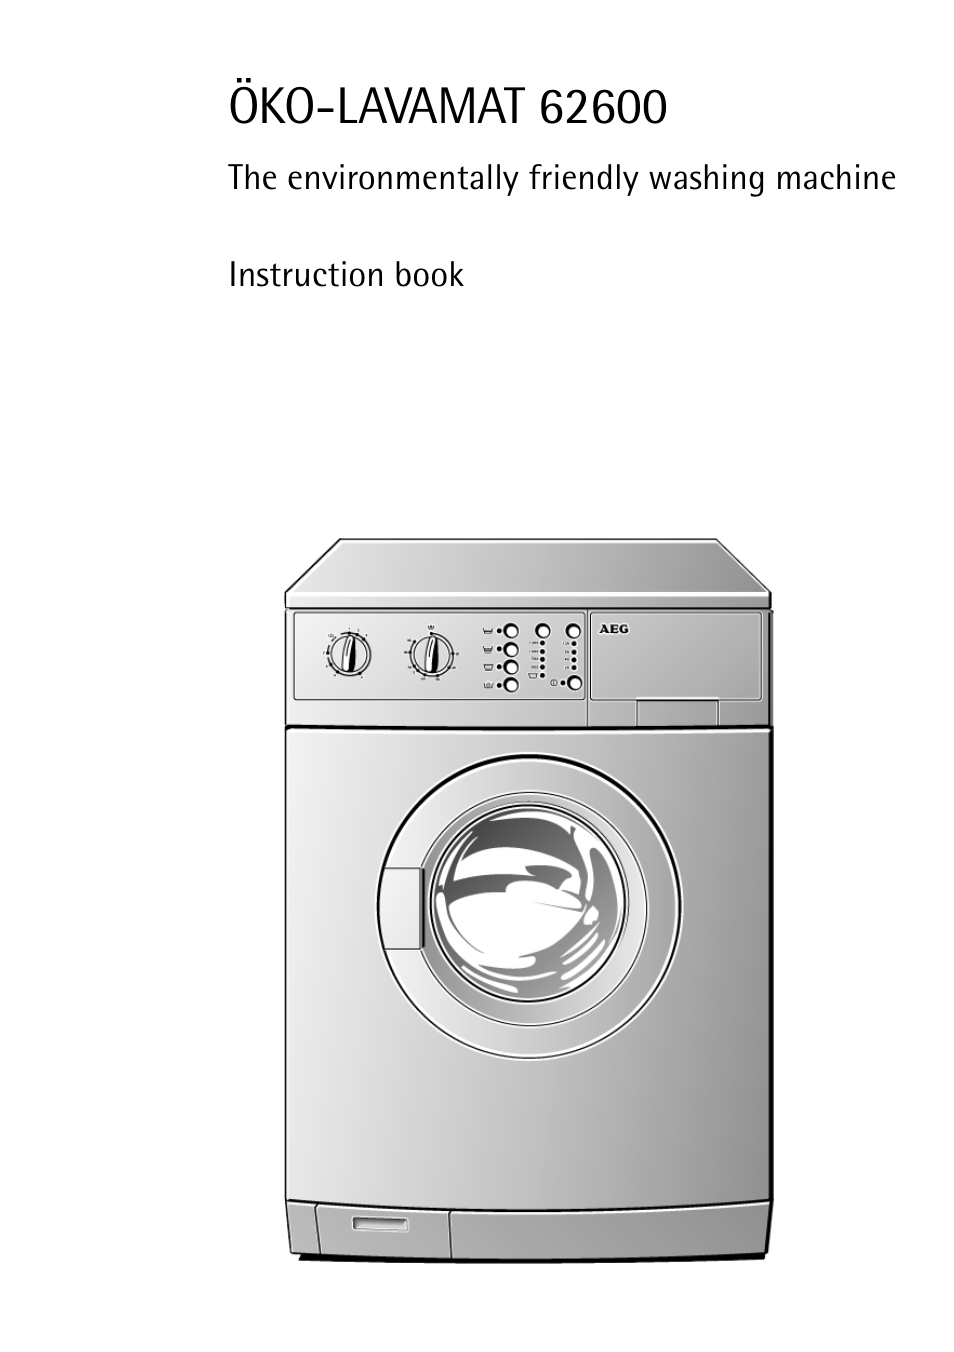 aeg lavamat 62600 user manual 52 pages rh manualsdir com aeg washing machine service manual aeg 8000 series washing machine user manual